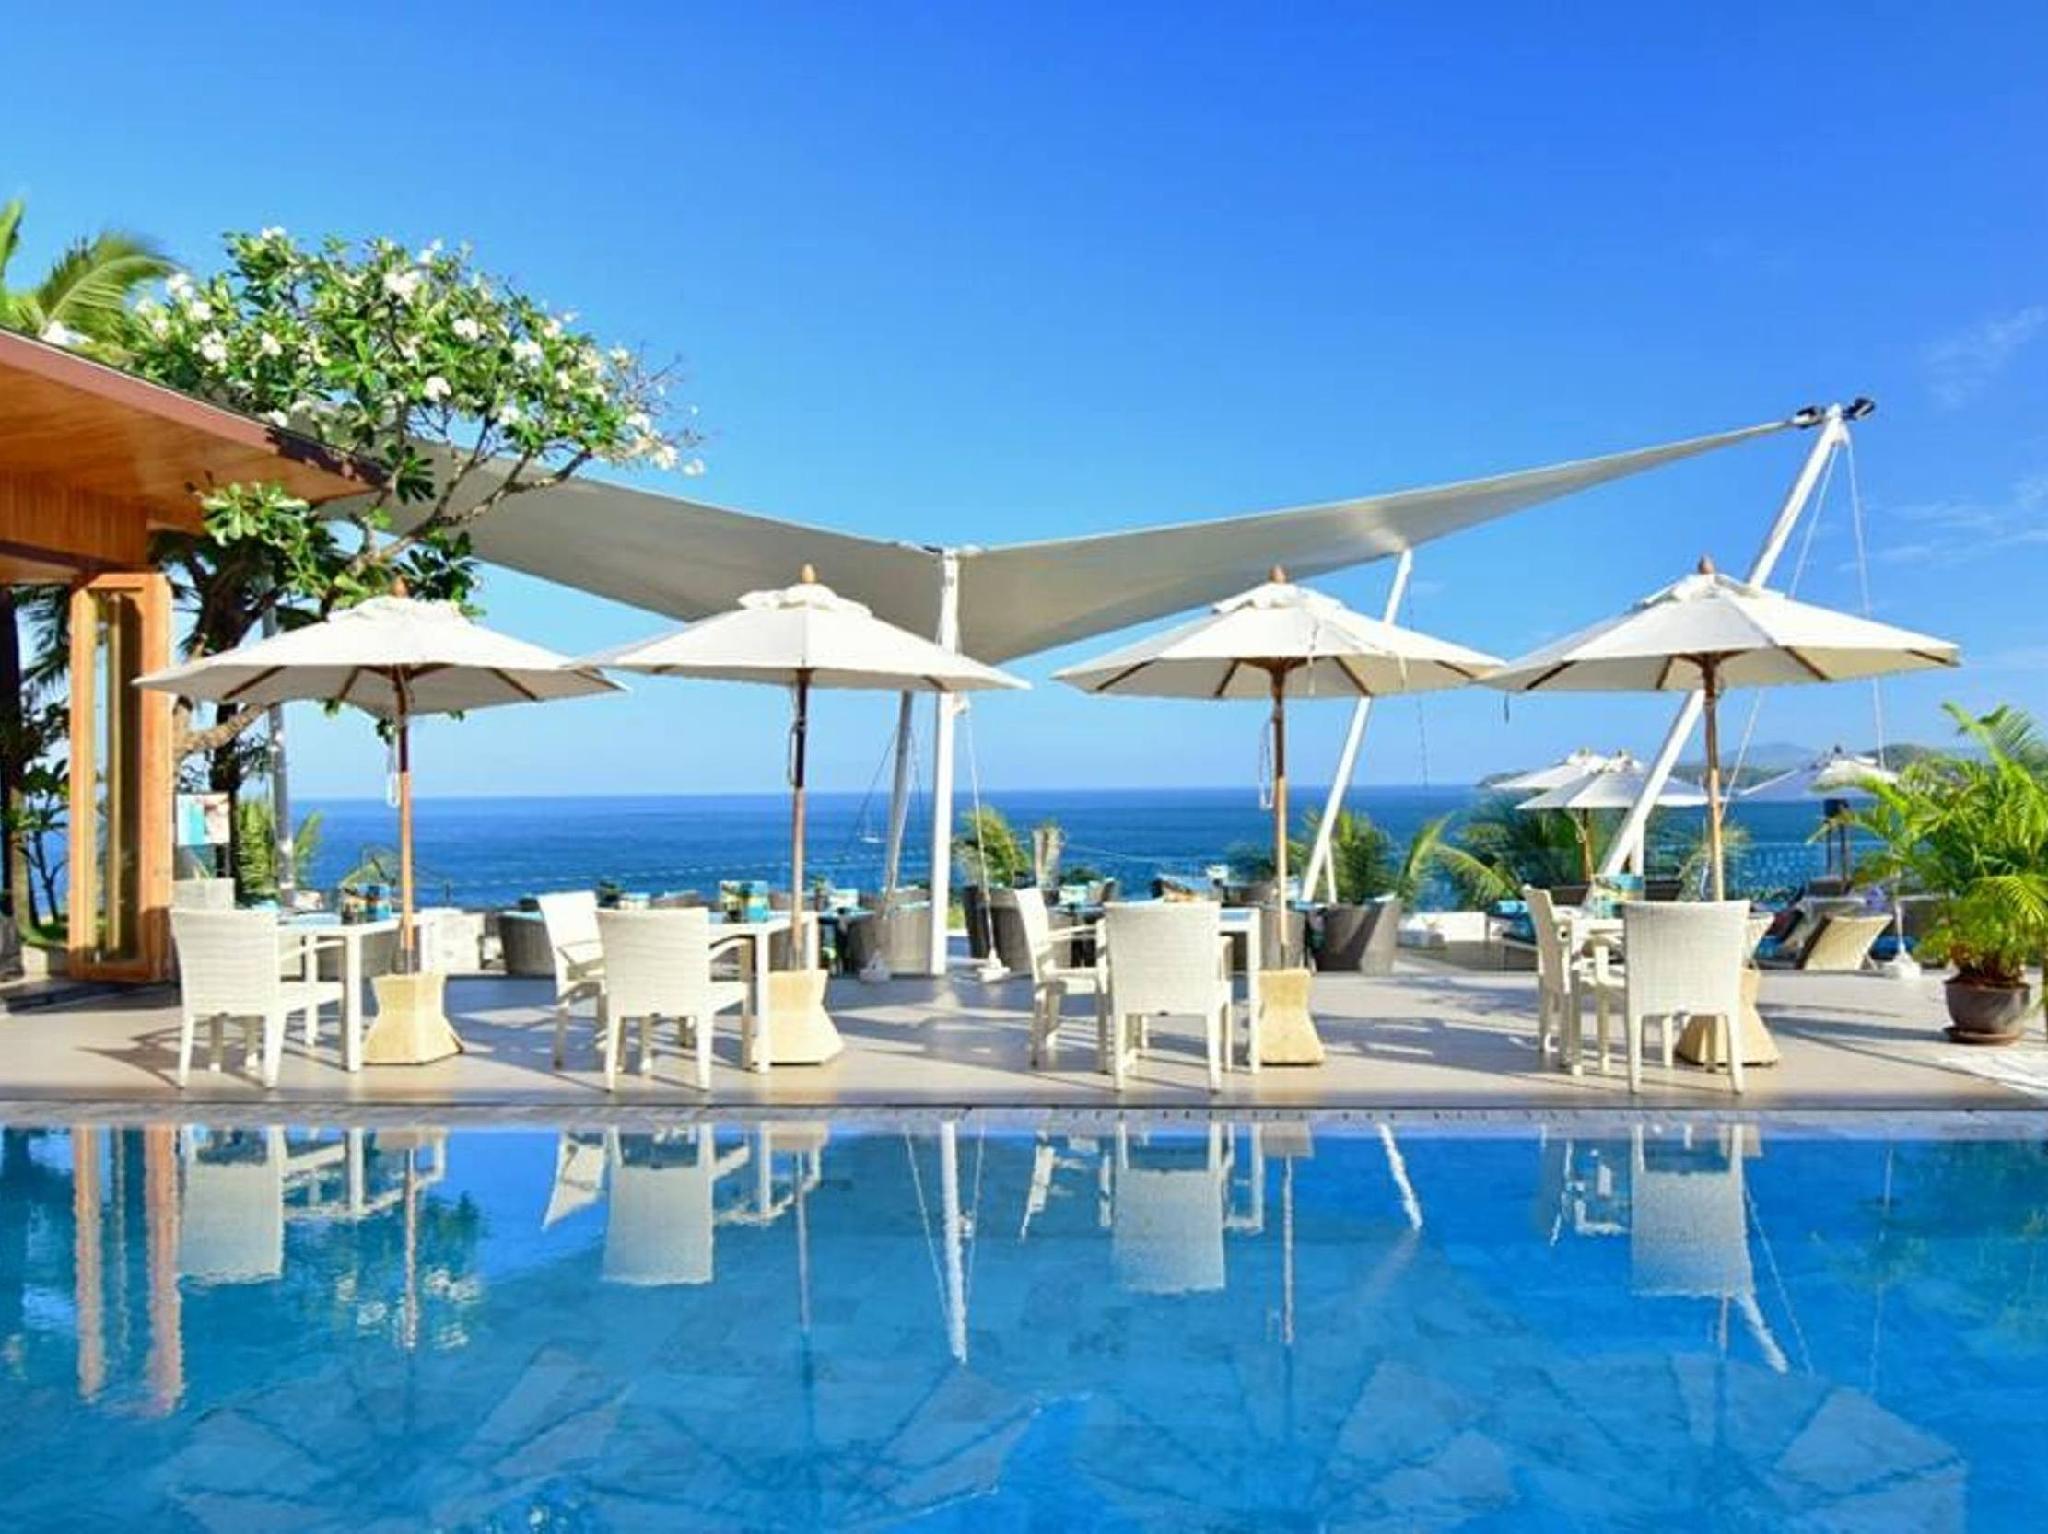 Cape Sienna Phuket Hotel and Villas25